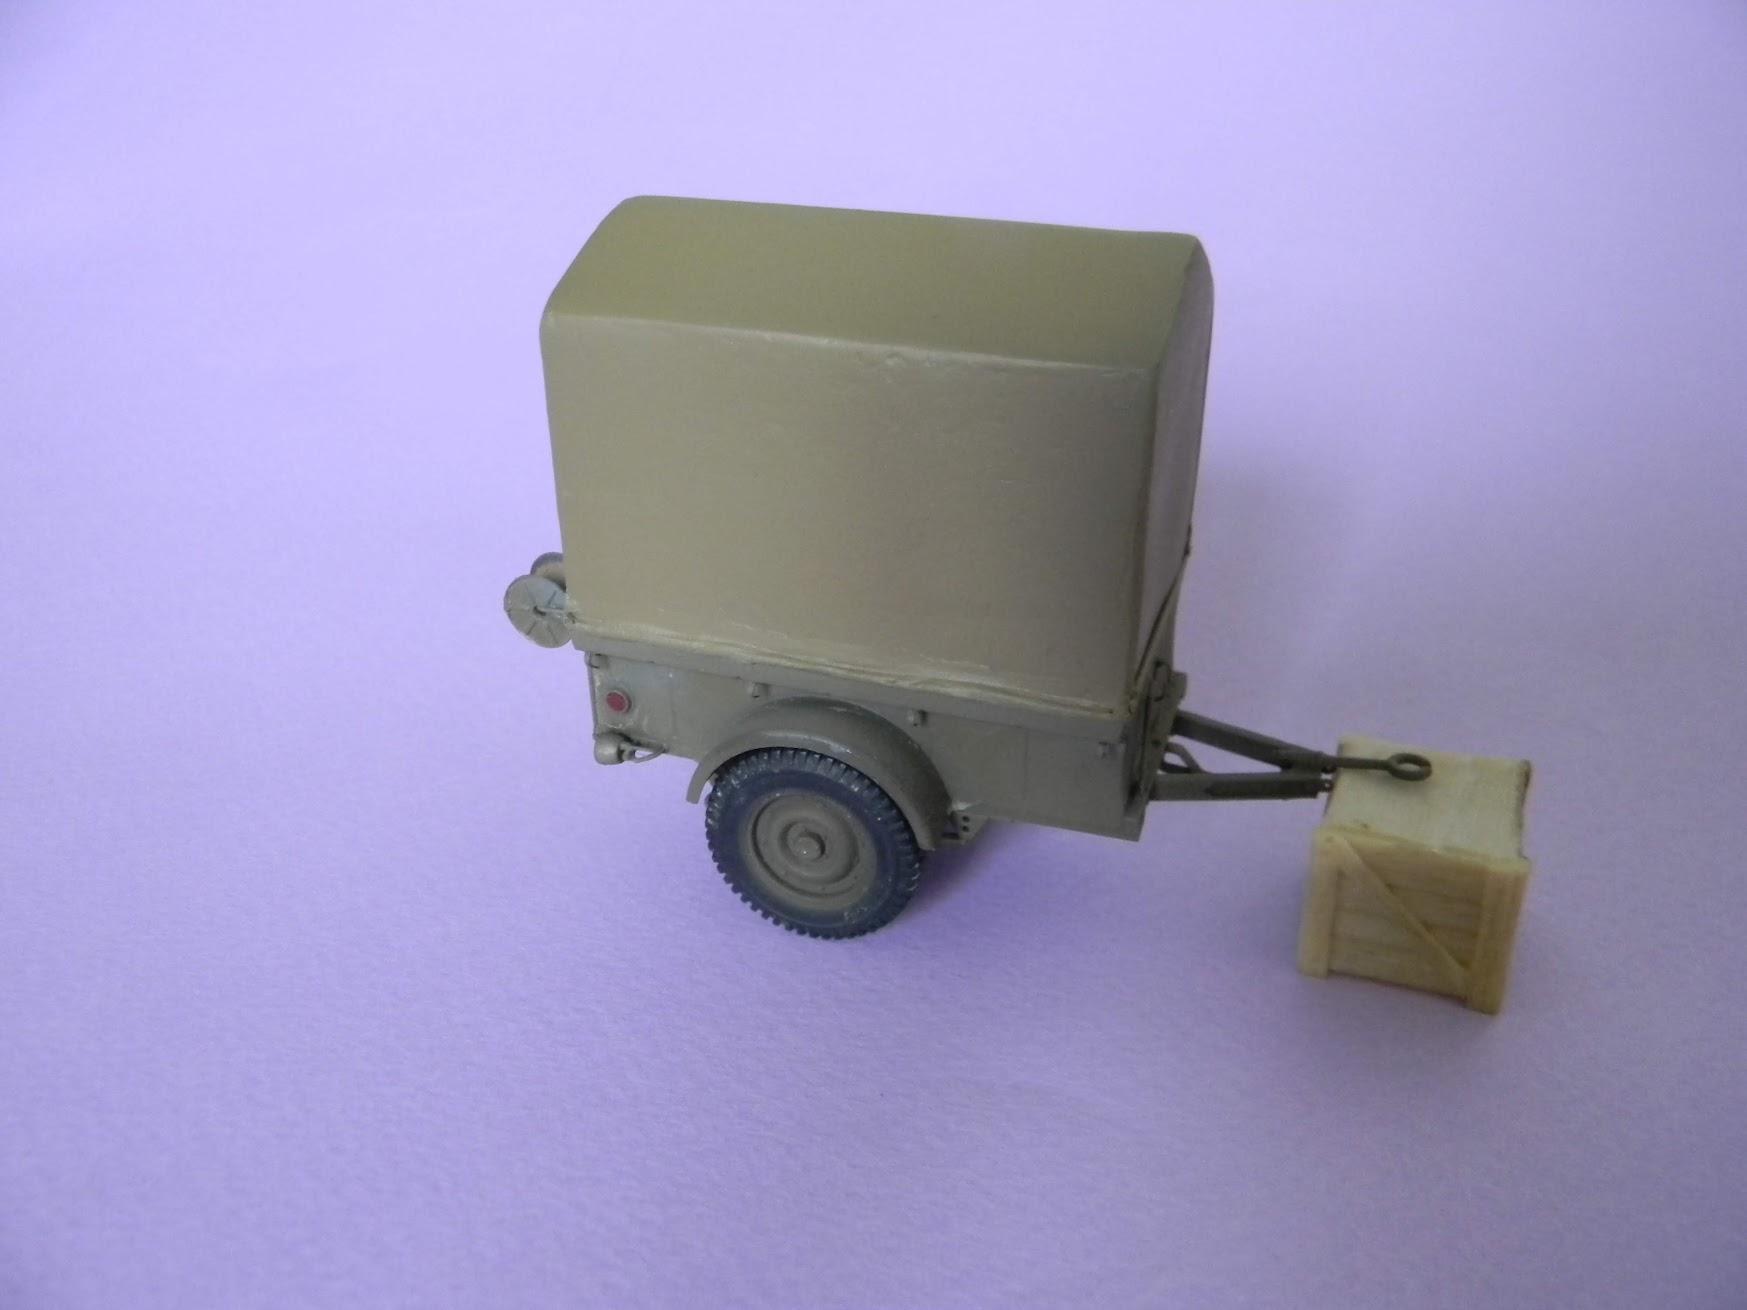 GPW 1942 Ford Bronco Model : revue de détail et montage - Page 5 H7chdL2-6mBZY2dJT0oFhAP7SVi6Ws9KIRCe1ypTCt9a9O0ptzLWjYnHP55Ncaoun4ct2jRgKCQge1C059NiFQZI0_QlaQk-t4g-G22MEzU-cIg0PTH0P3lIlRnfLFpUlXJmXHnaDhSzfx_QMtzq0K25CxyijUhYSqOVk-DRWNVNG_IXRkXg0cUrnwggQ8vBuBjnmxNRIXxIc3sDUtSCIv0c-8LJqxQOT9fnSWCzu-JFrGjsxf0p6_zgjtHQVwjBELKwtwBuxWucNceUPINTgTKv7UnJ2CGA4sgSULODdpt0MU7kEFzoKUMTAvWjSRZxOMyudU93oCttNFBceMIJ-VjHDjKRIySvdGvgV1O_LLNZJ1tEj3xlhIrZDDZaOTJbHXsdqy8H463lTQzQ-Gtt8XfwgXOp4AMwOpAH0fwdSlXMVBtJEOyDYeckSfXeHyVvduFIFPda3Ep_VsqFmaS-7nkfJLA341IiYW8zg-5jjtE0d8qqKUiEIzj22dC8T0UAWUVkgBruCBgp7UUDCvQUt7WPhFFCBX-0WVm1wgFAO5FFfKwAFyhHfXy_NA8B8Jj5Xy7FlS_wv92Hs2Lwws7yQRVRGELbqo0JyTYgrTX-MCuc6ykLOq2n7xqeROwHZOnIeyz6XU1l3dWPVMa4bjMlgp34QmWprnGqnGDzzyCx6IFbmxZFGw2rwyg_2_CkuZEHR5qQw1ely9BqubOV5W5N8JV8klPhCtghQWyo0FbnP3IjMl0Ceg=w1747-h1310-no